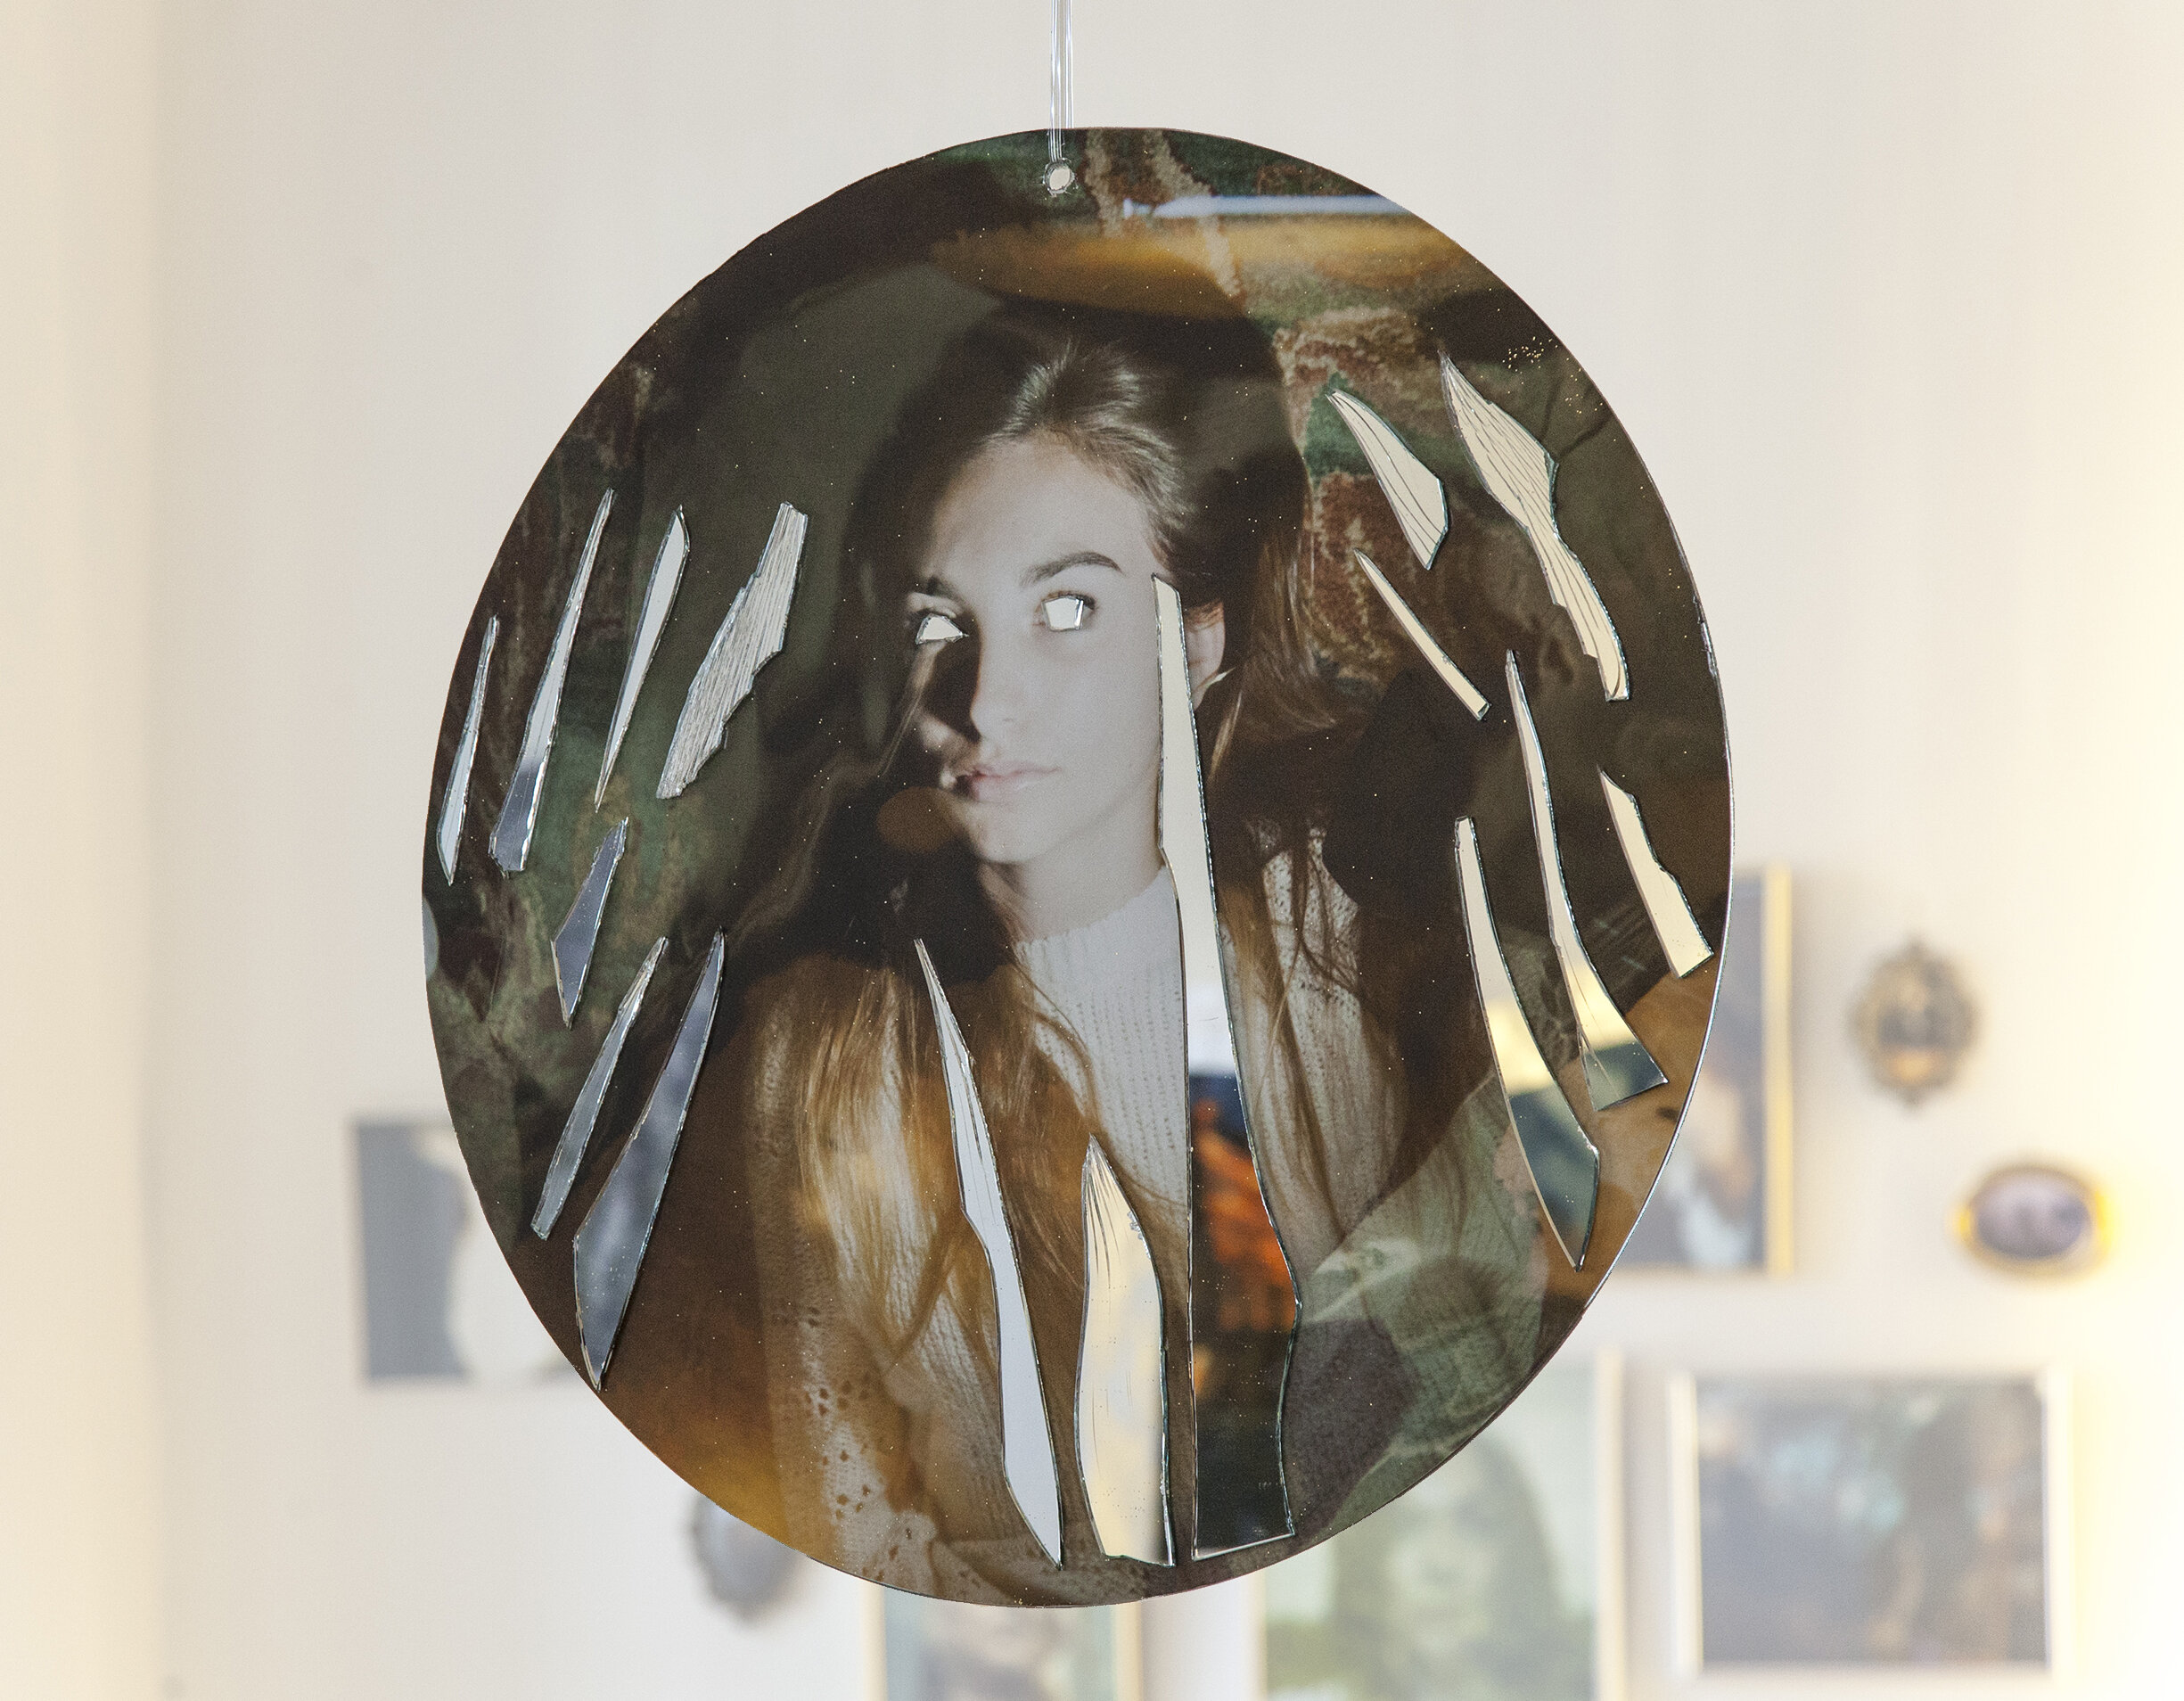 2 faced , side 01, Gyclee print on mirror, acrylic gel+glitter, 20x20in, oval, 2019